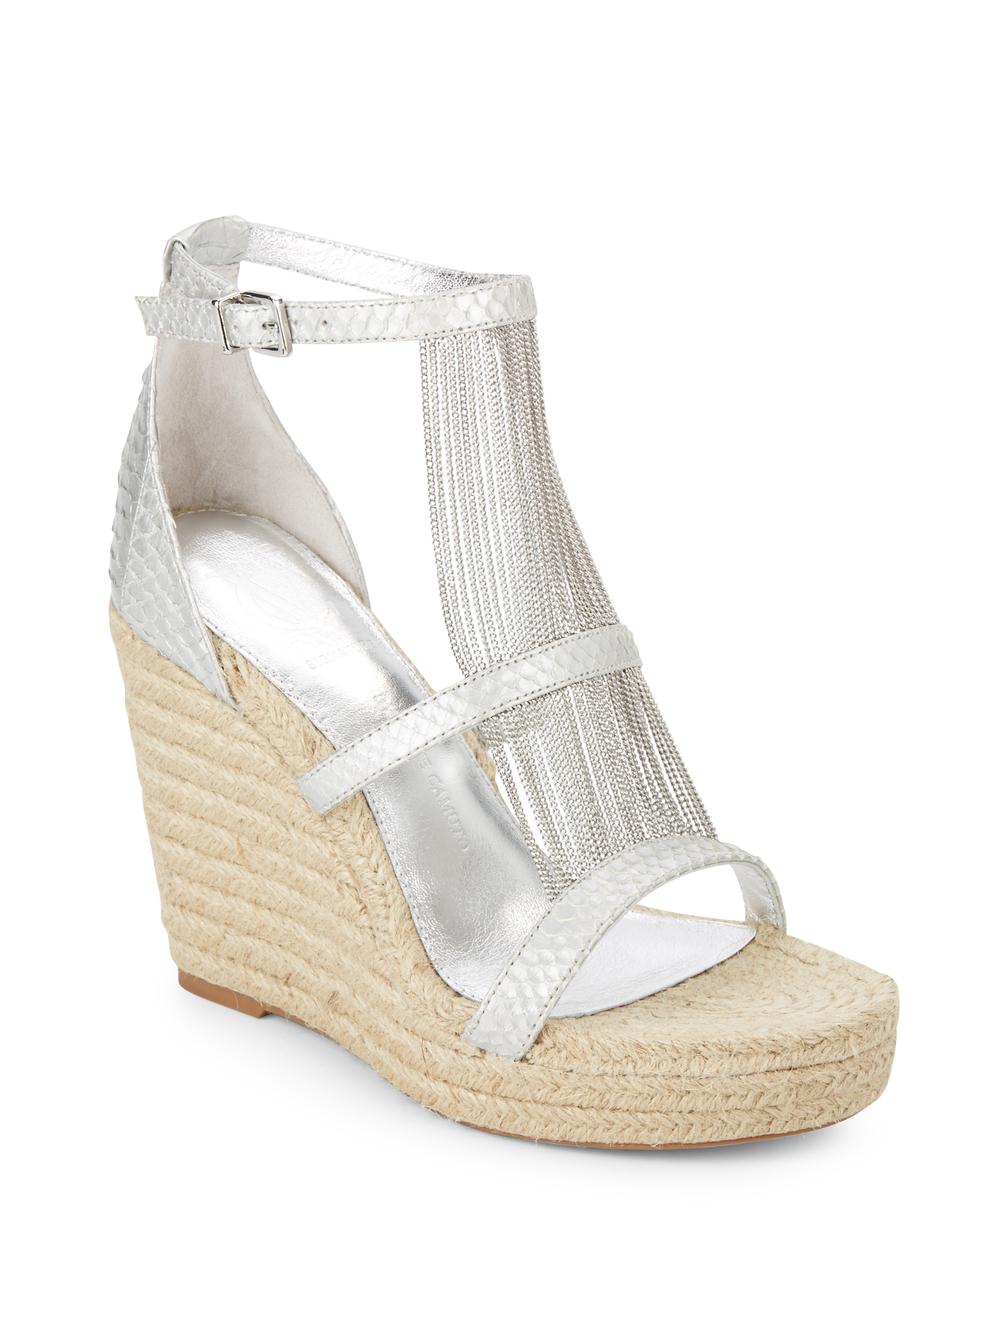 Shoes-008.JPG